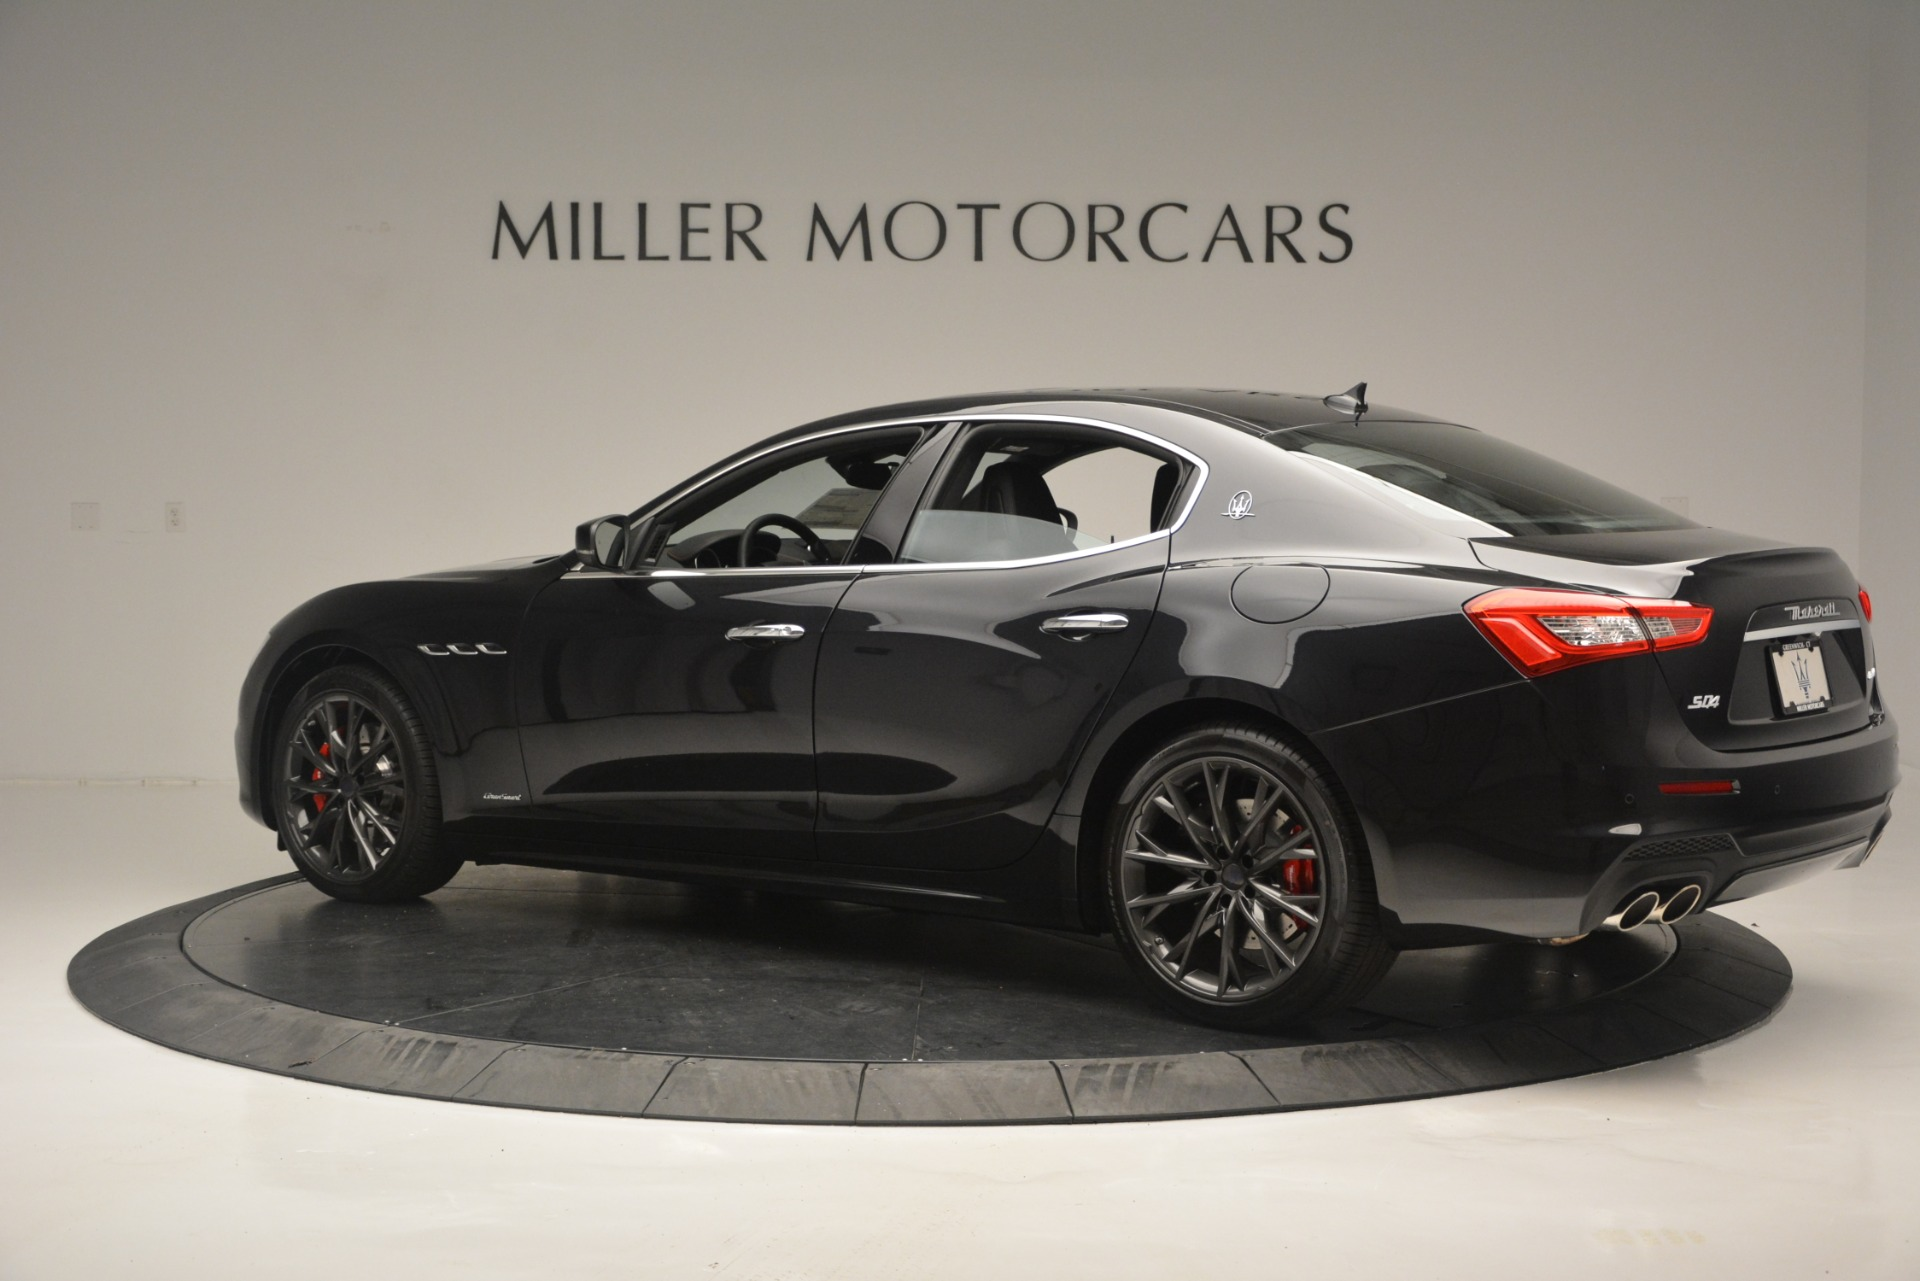 New 2019 Maserati Ghibli S Q4 GranSport For Sale In Westport, CT 2635_p4